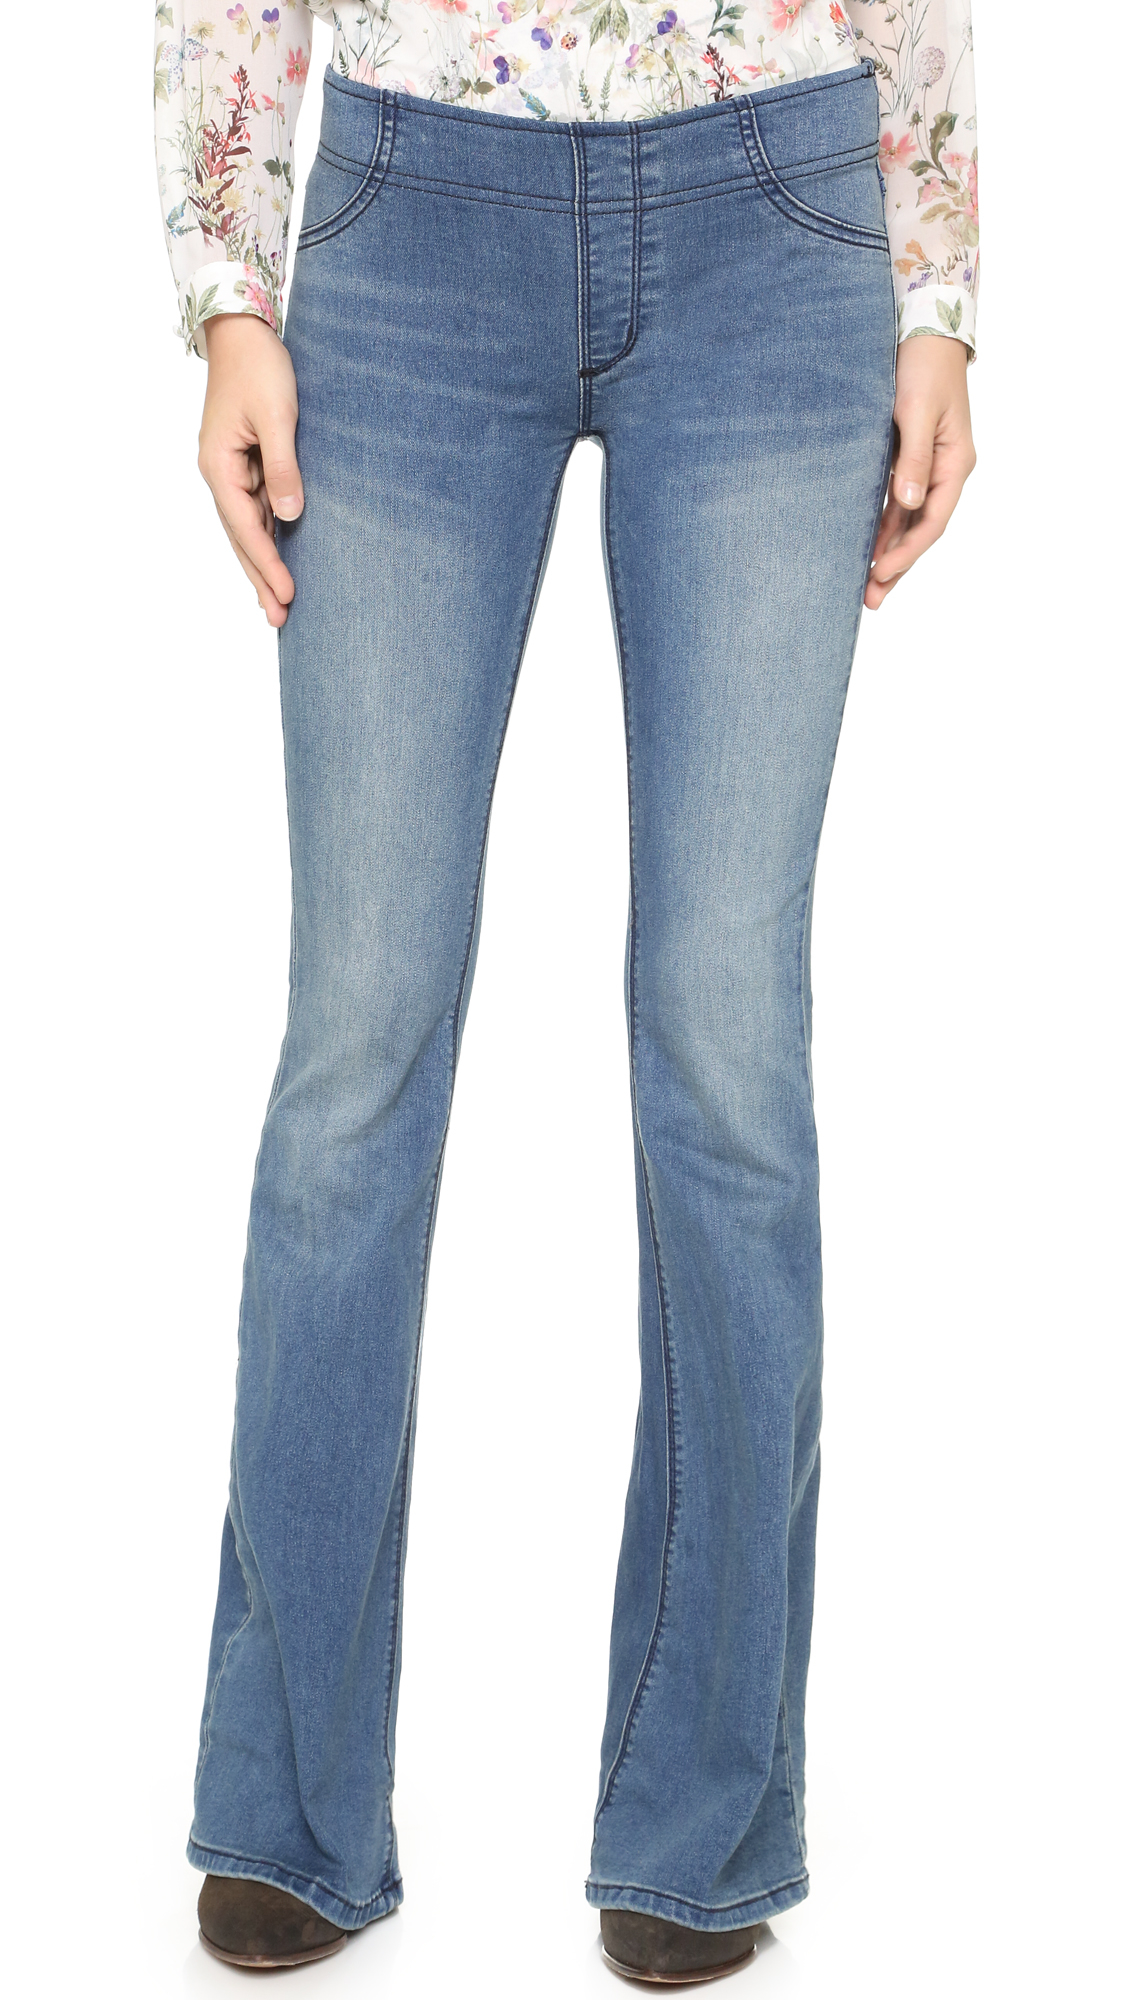 jeans depth of - photo #22